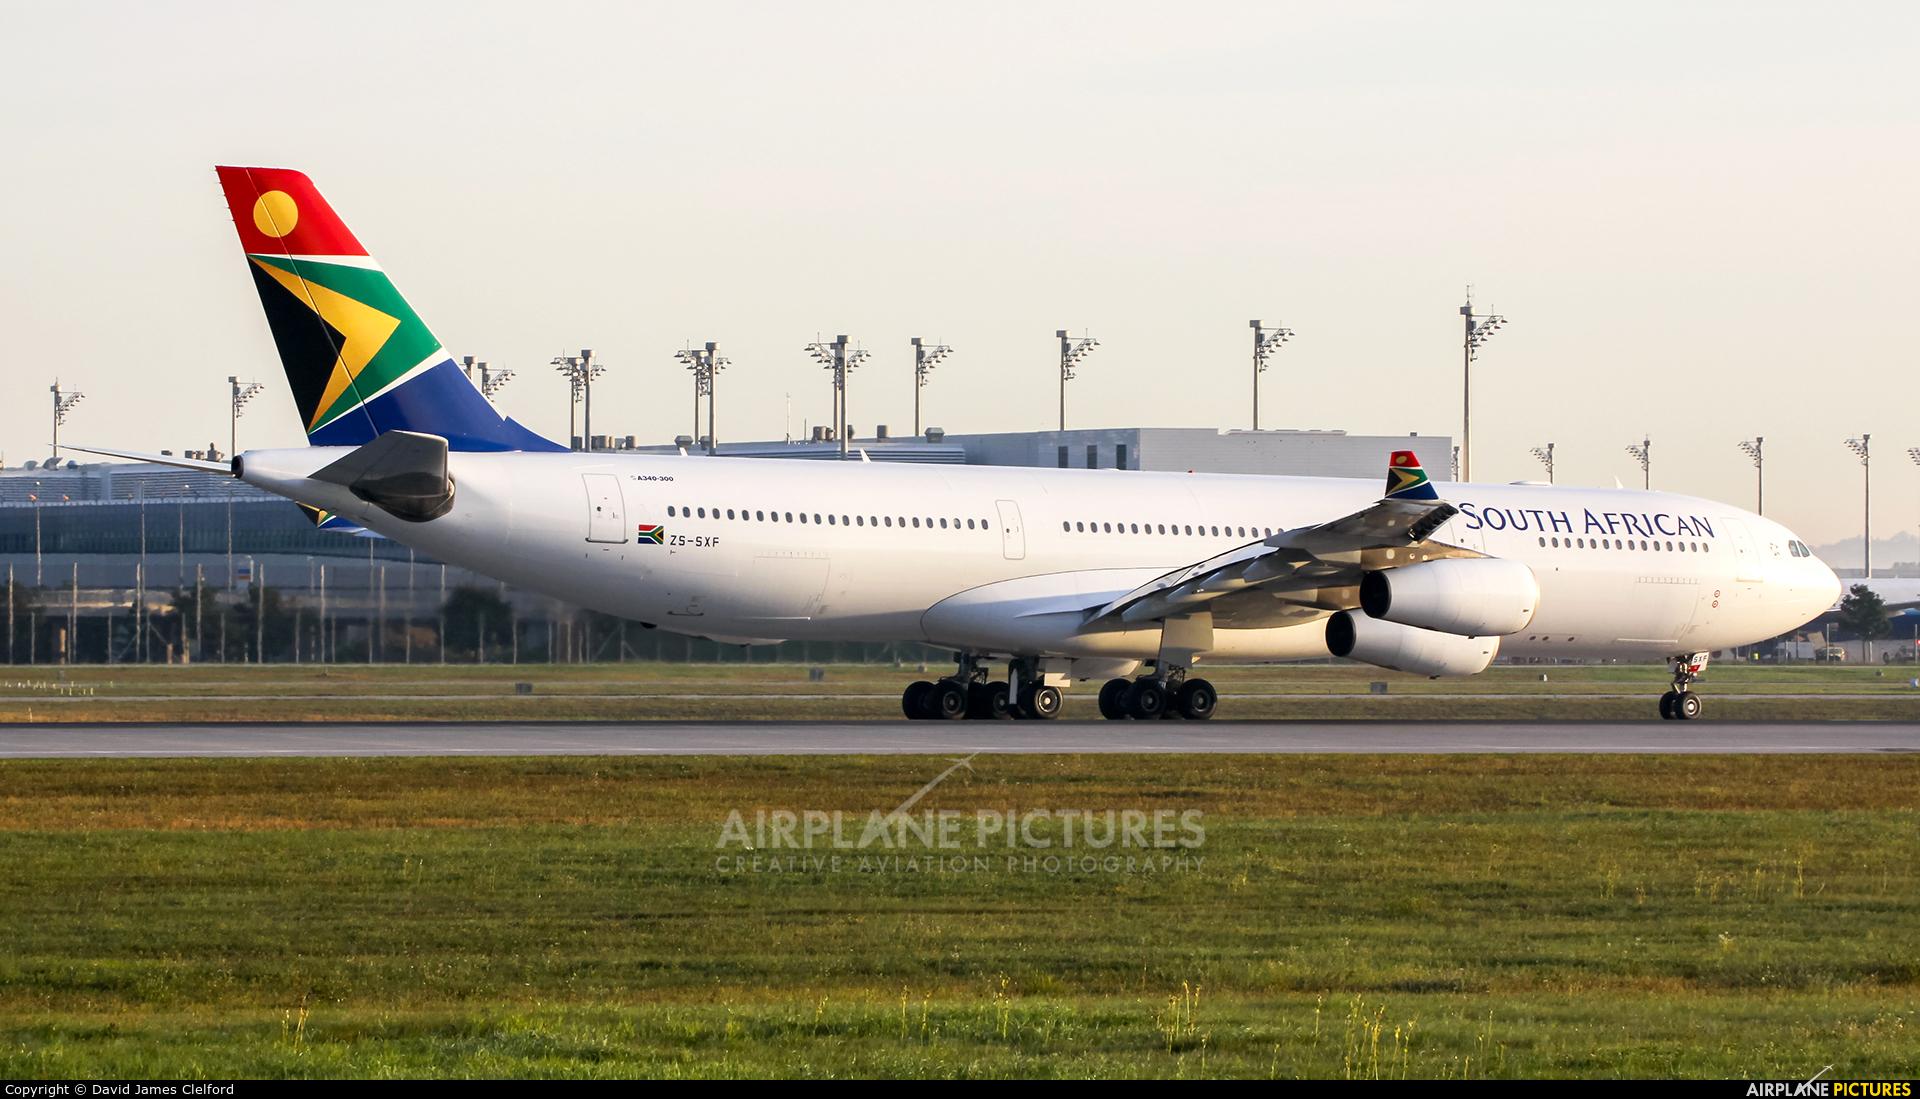 South African Airways ZS-SXF aircraft at Munich